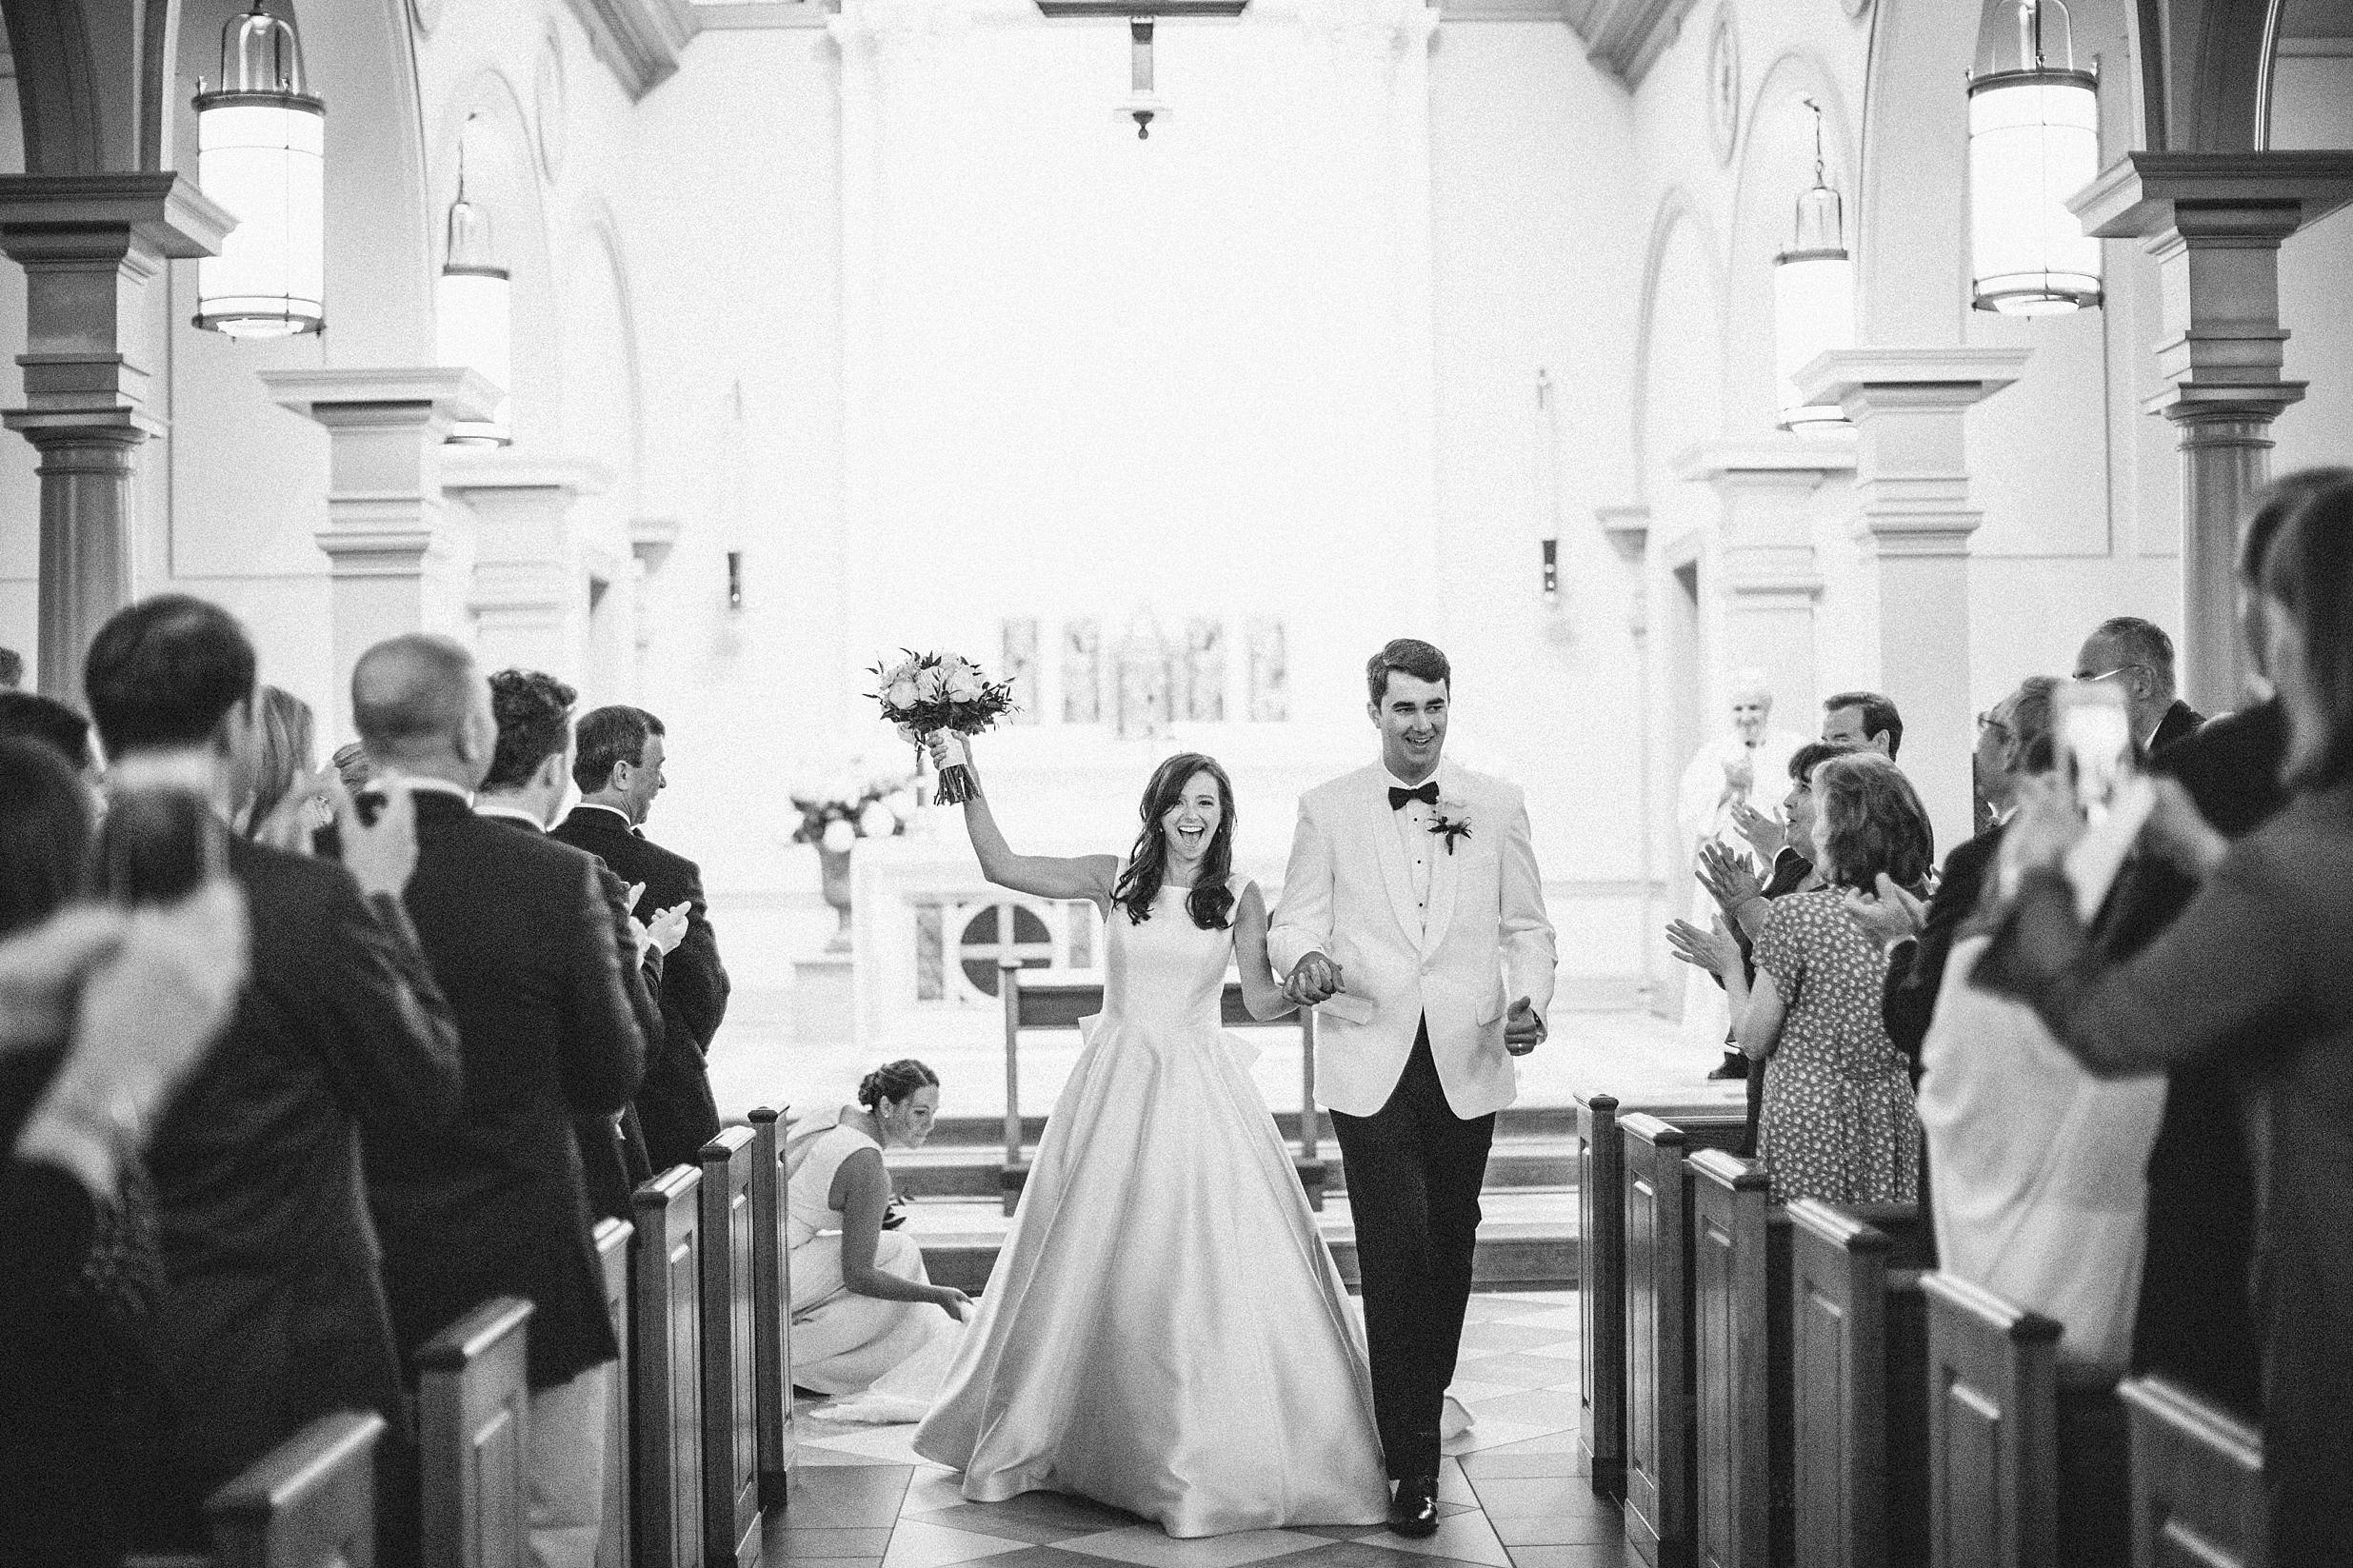 rumson-tented-wedding-nj-maine-conneticut-classic_0021.jpg